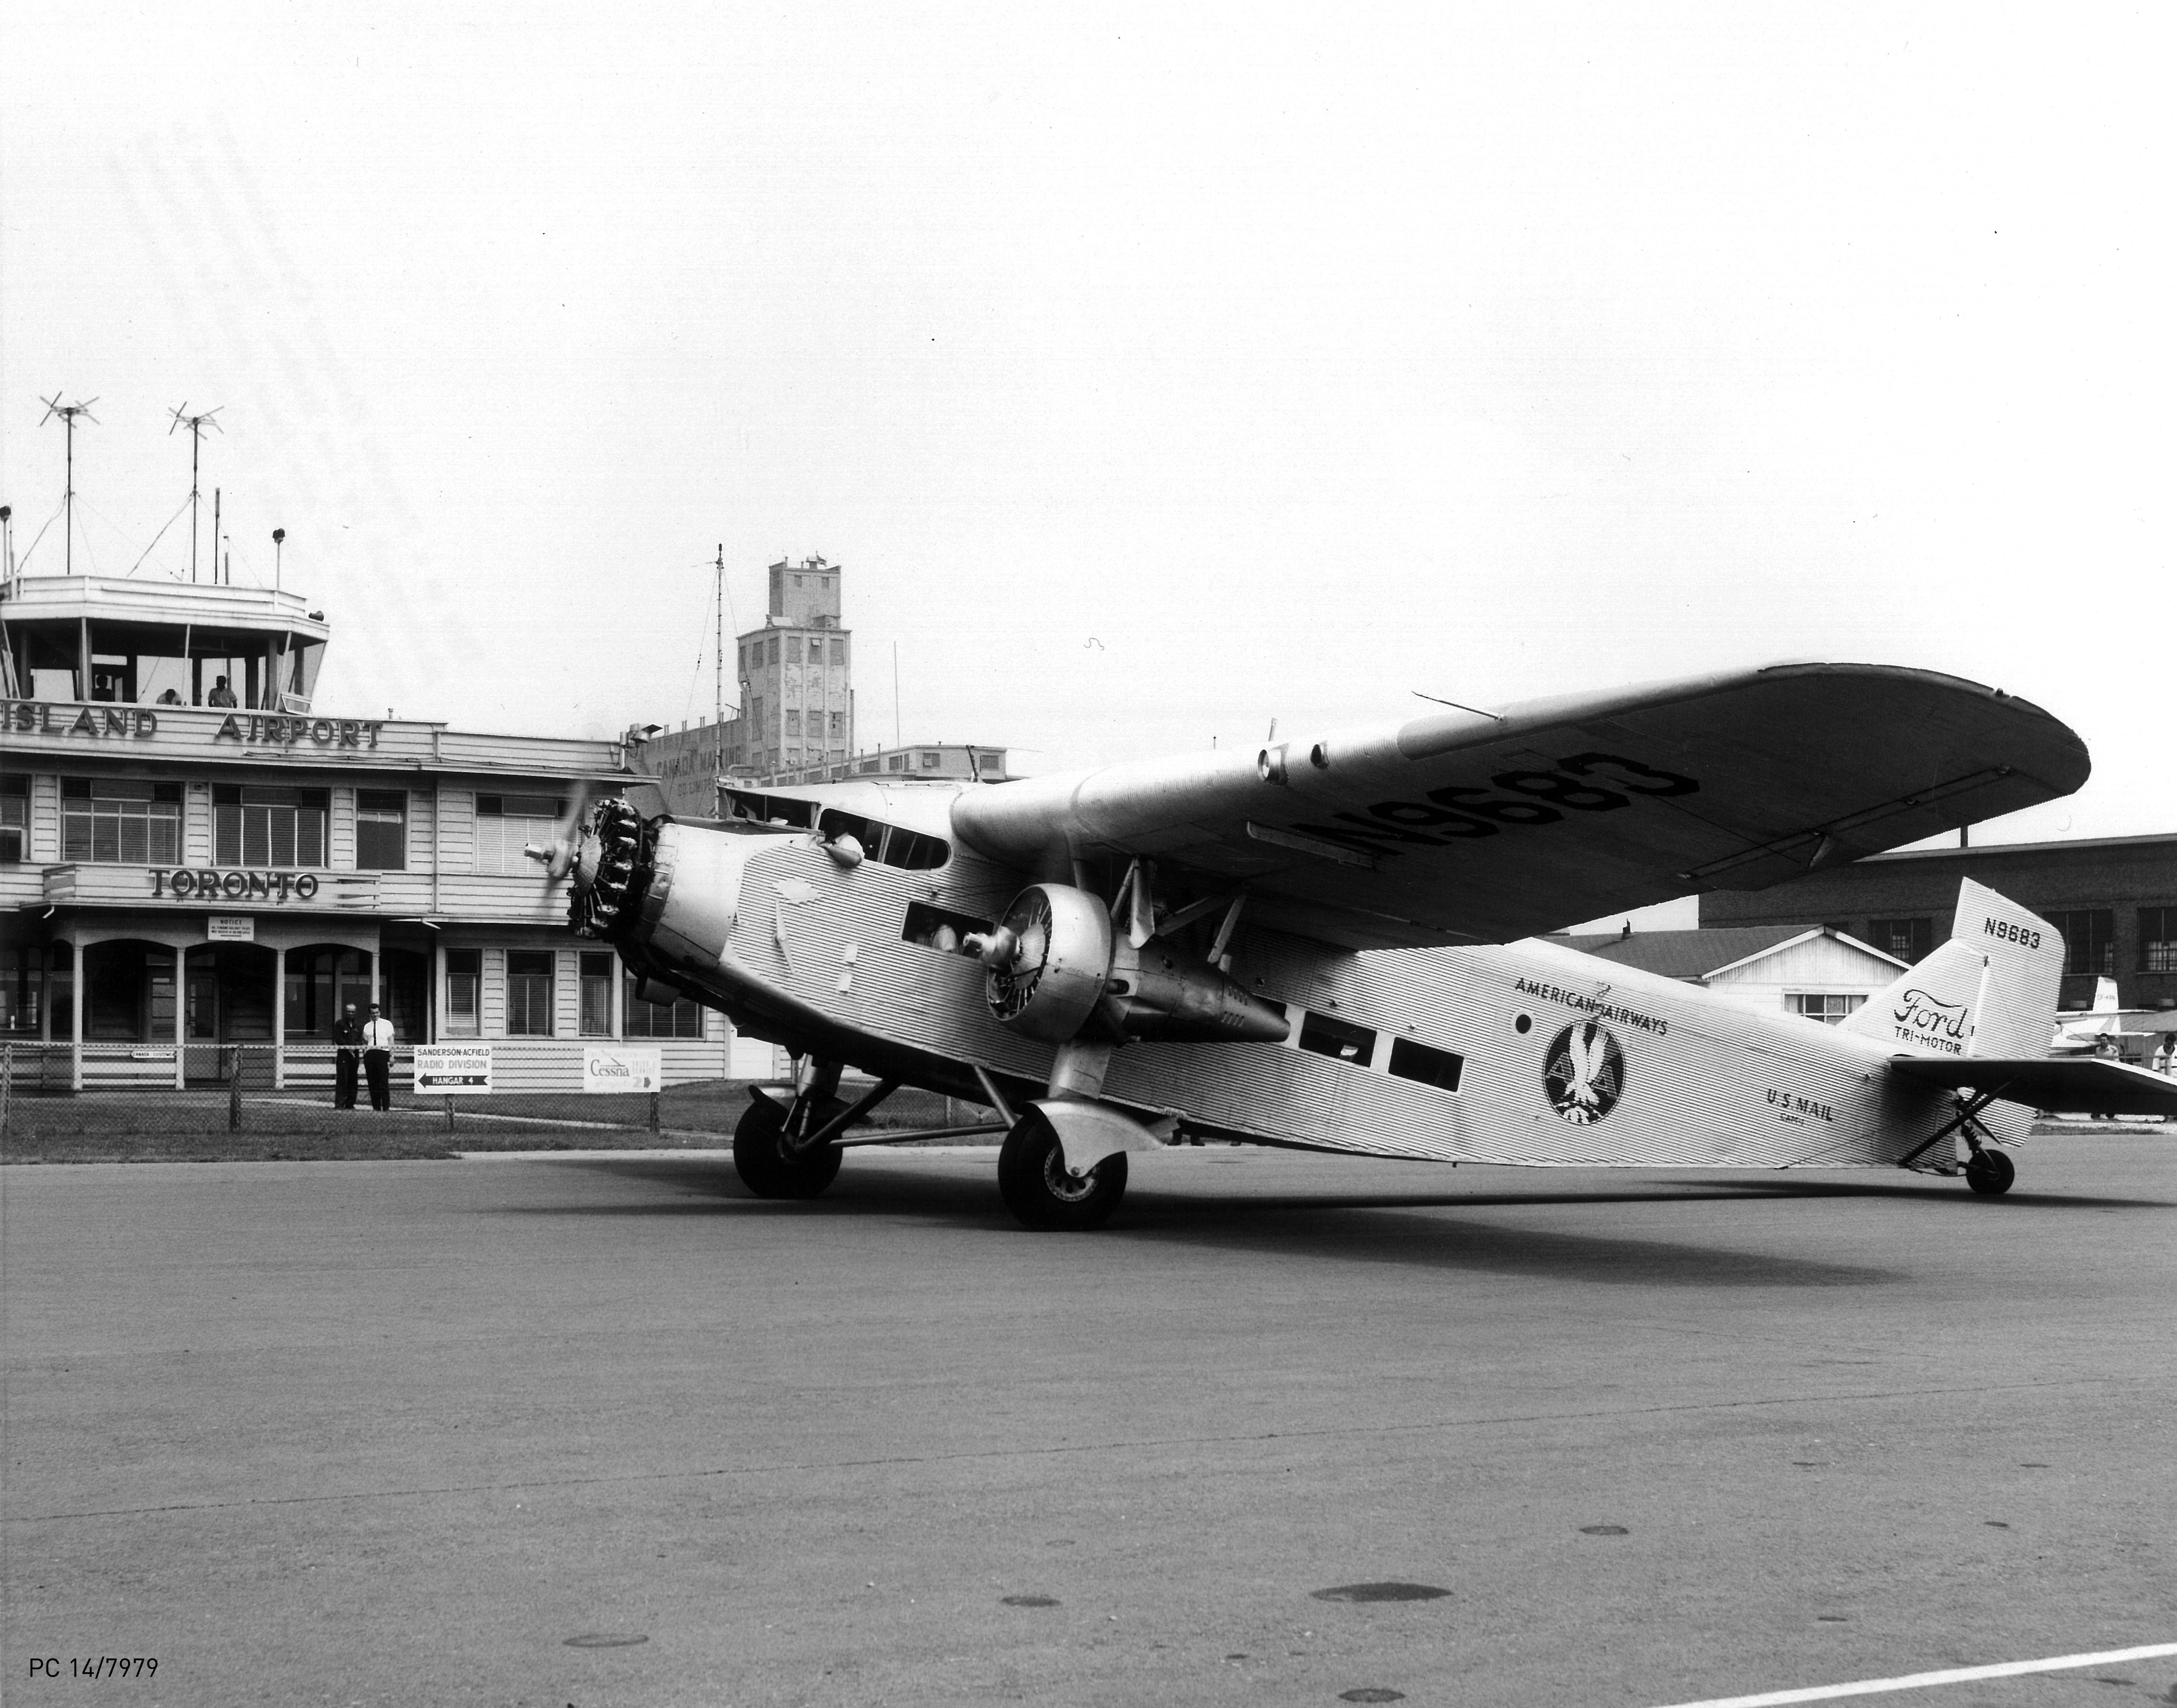 Vintage Aircraft Engines 77